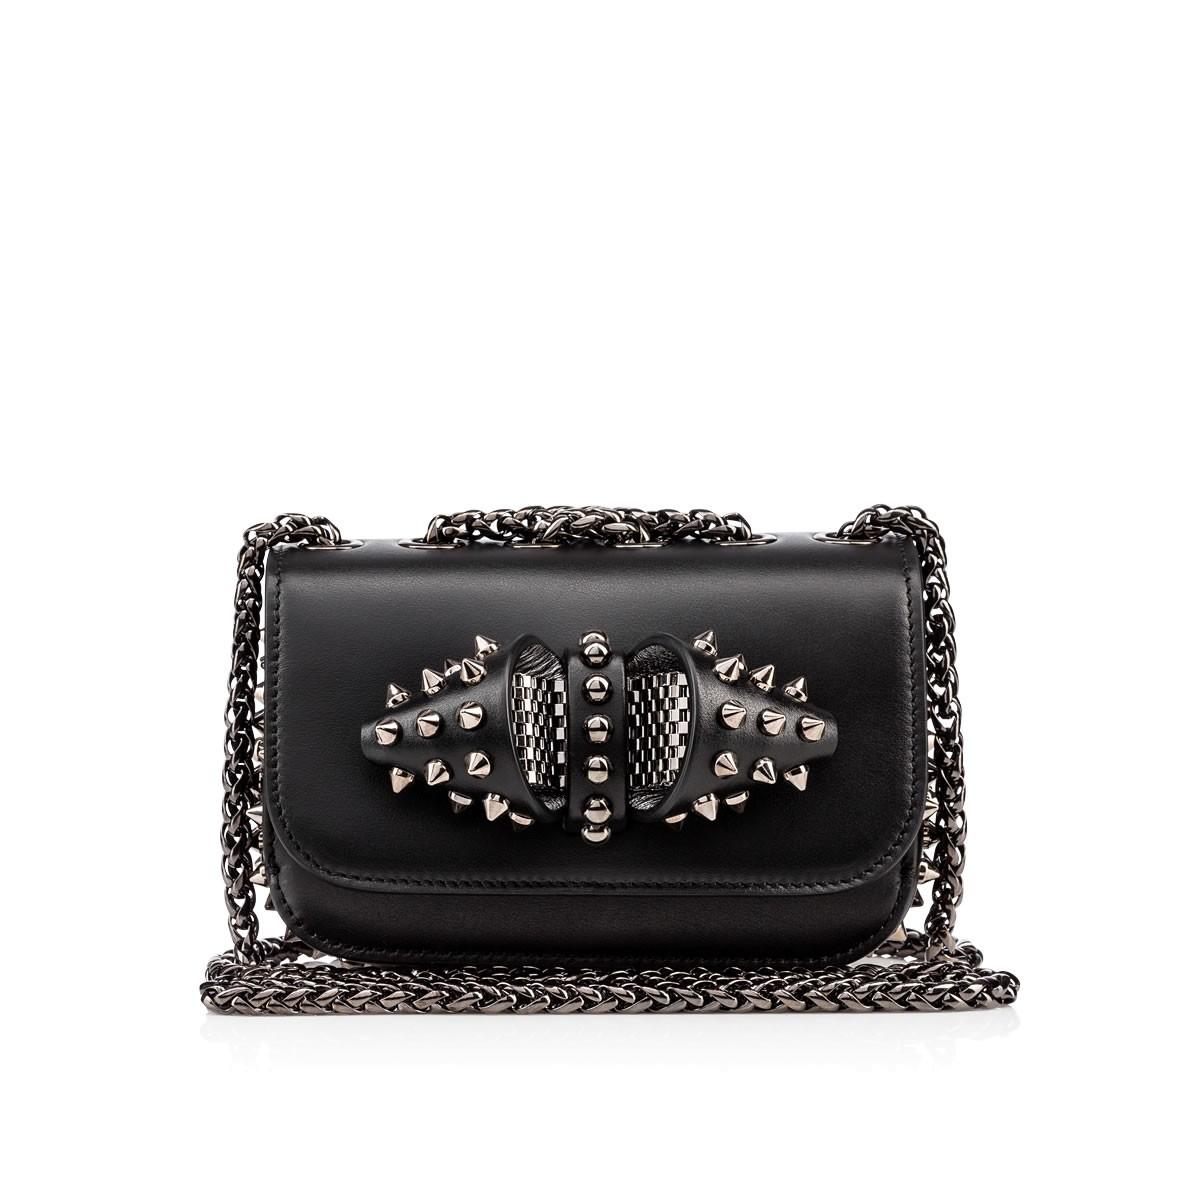 fd3dfa86e1f Sweety Charity Leather Shoulder Bag in Black